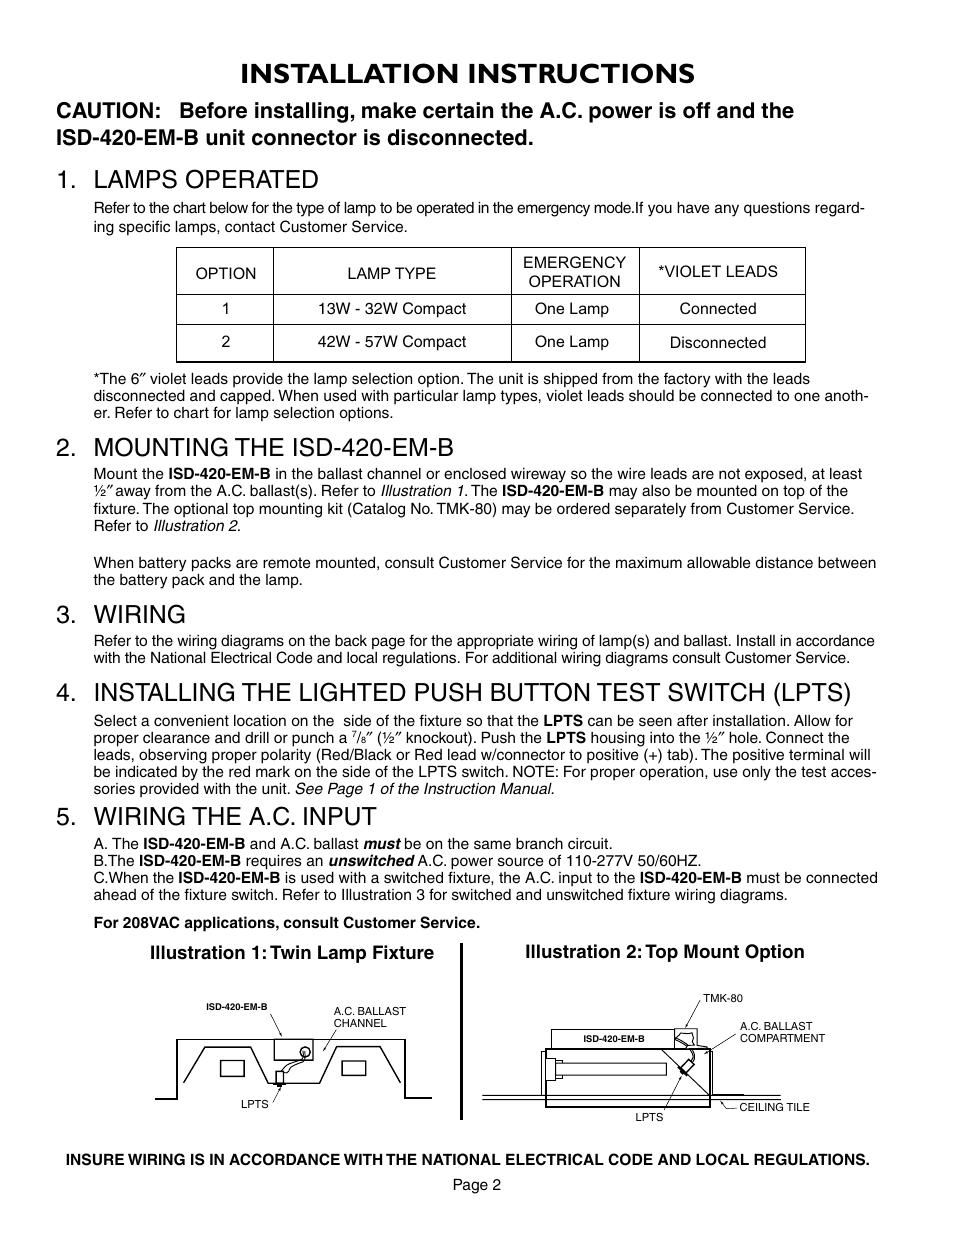 iota isd 420 em b page2?resize=665%2C861 iota i 80 emergency ballast wiring diagram wiring diagram iota i 80 emergency ballast wiring diagram at bayanpartner.co